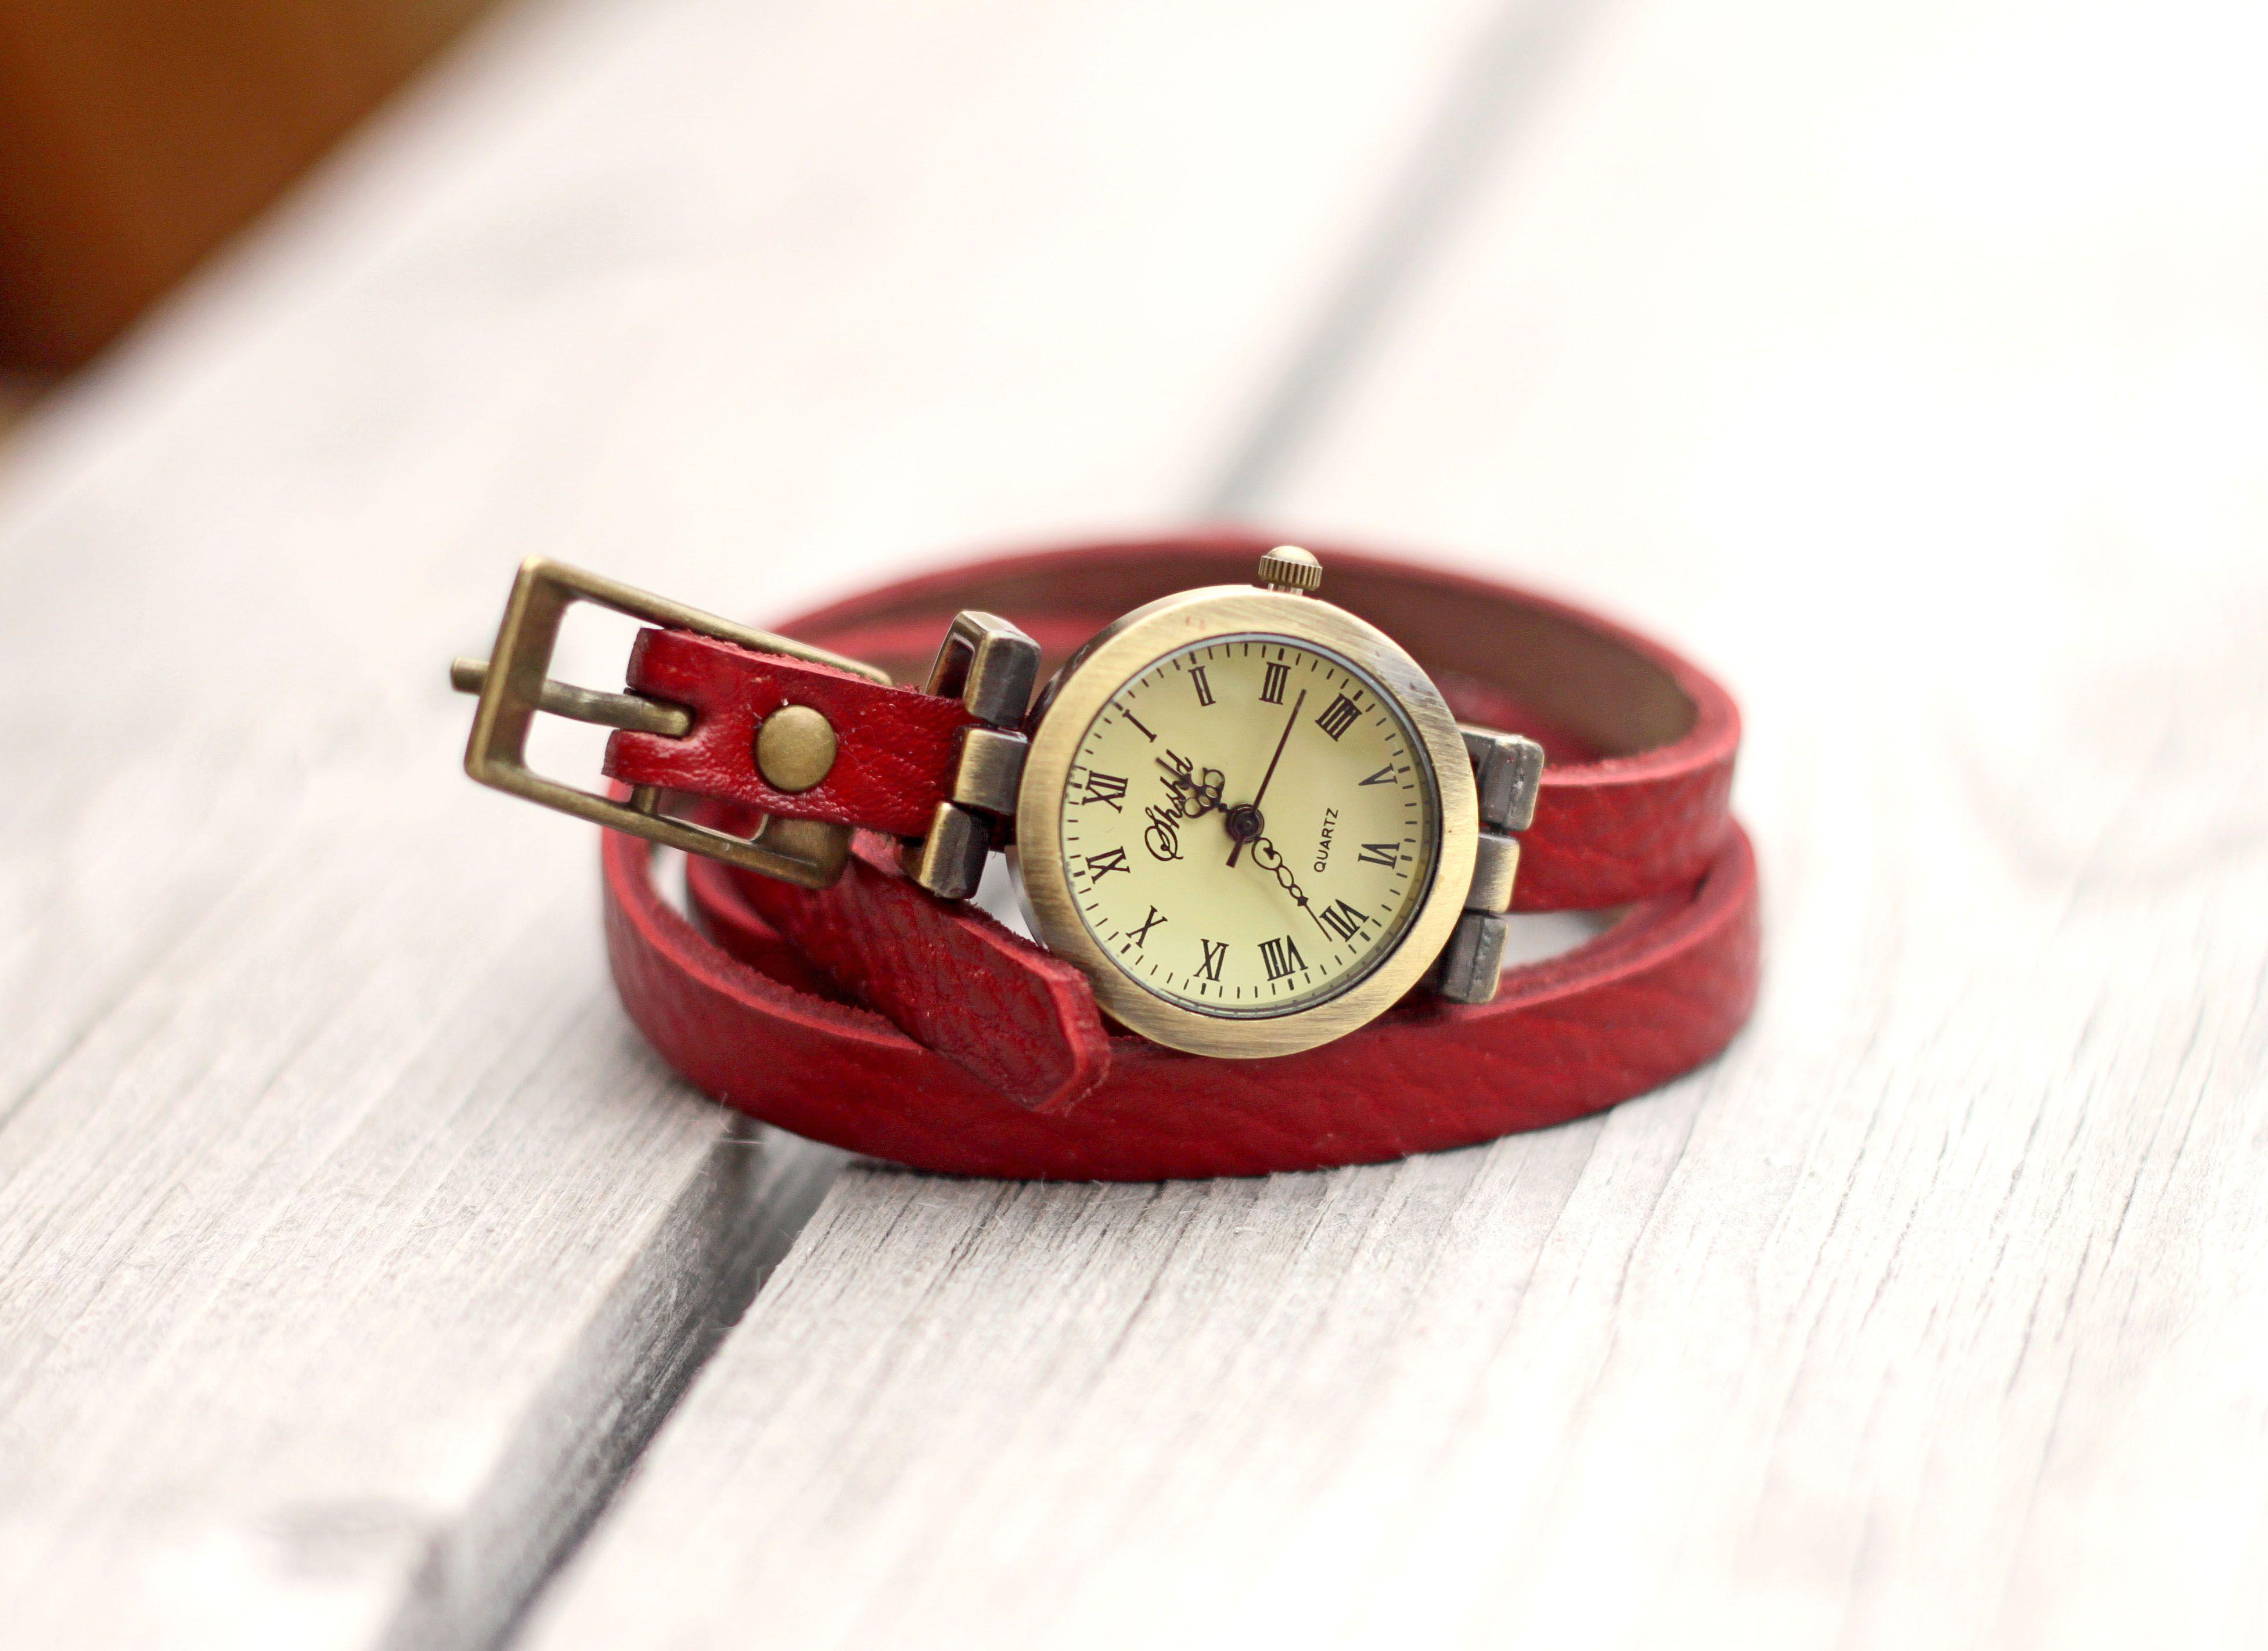 Vintage Wrap Watch Vintage Wraps Leather Watch Jewelry Making